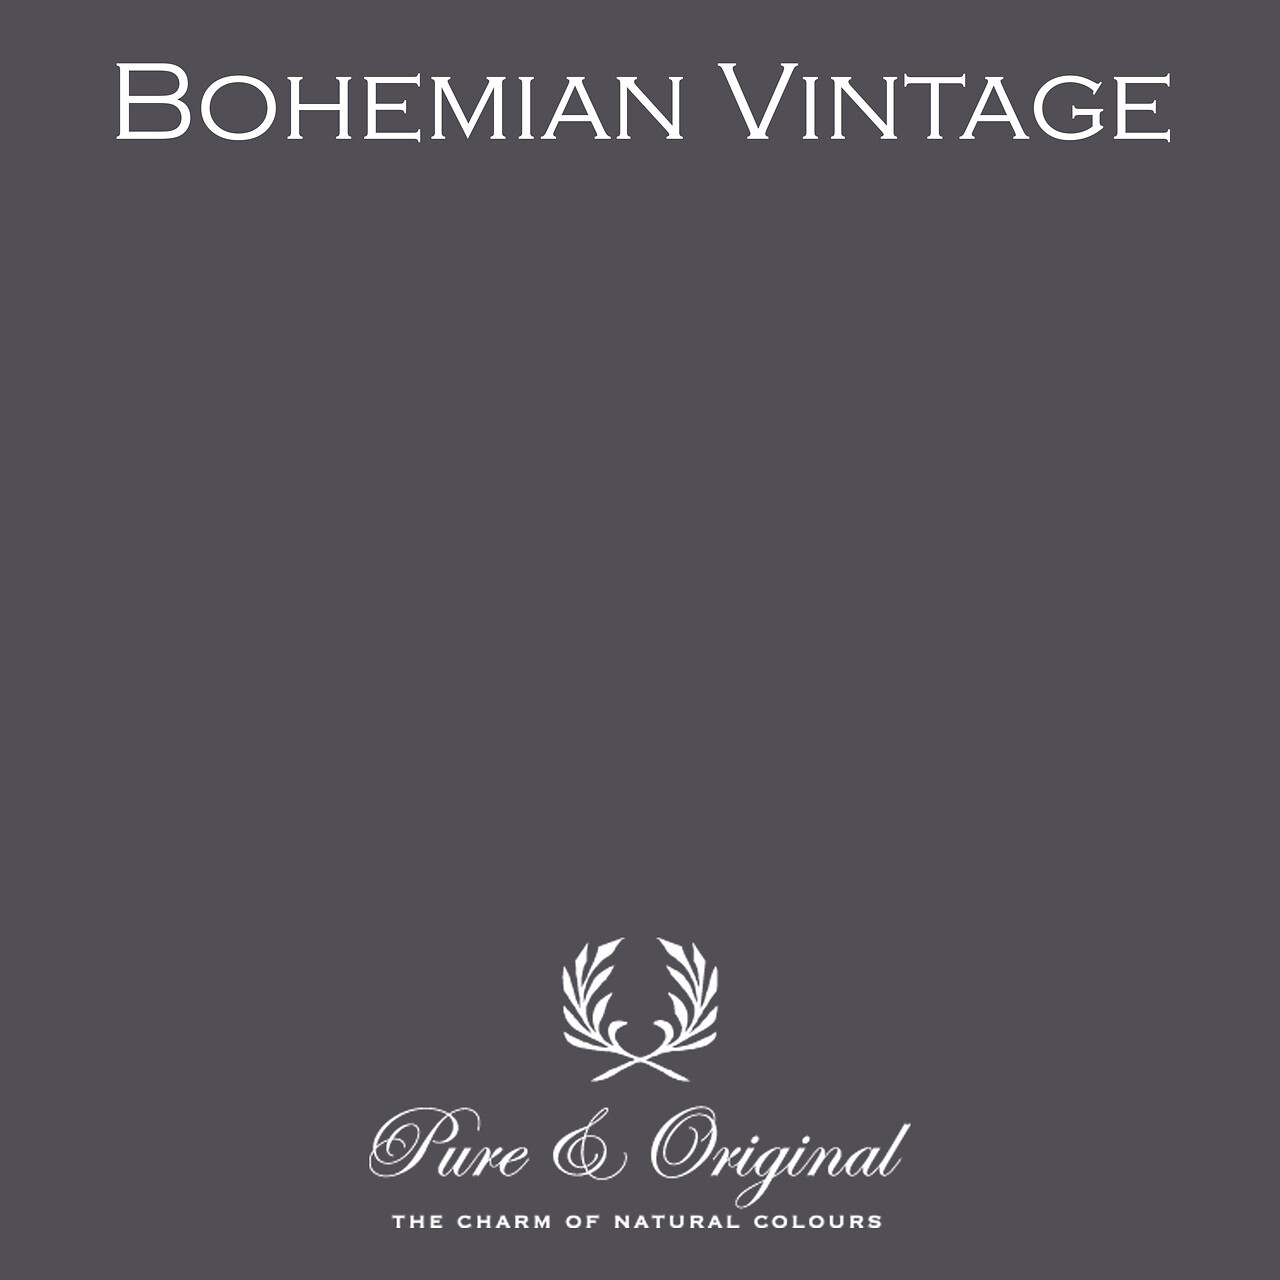 Bohemian Vintage Classico